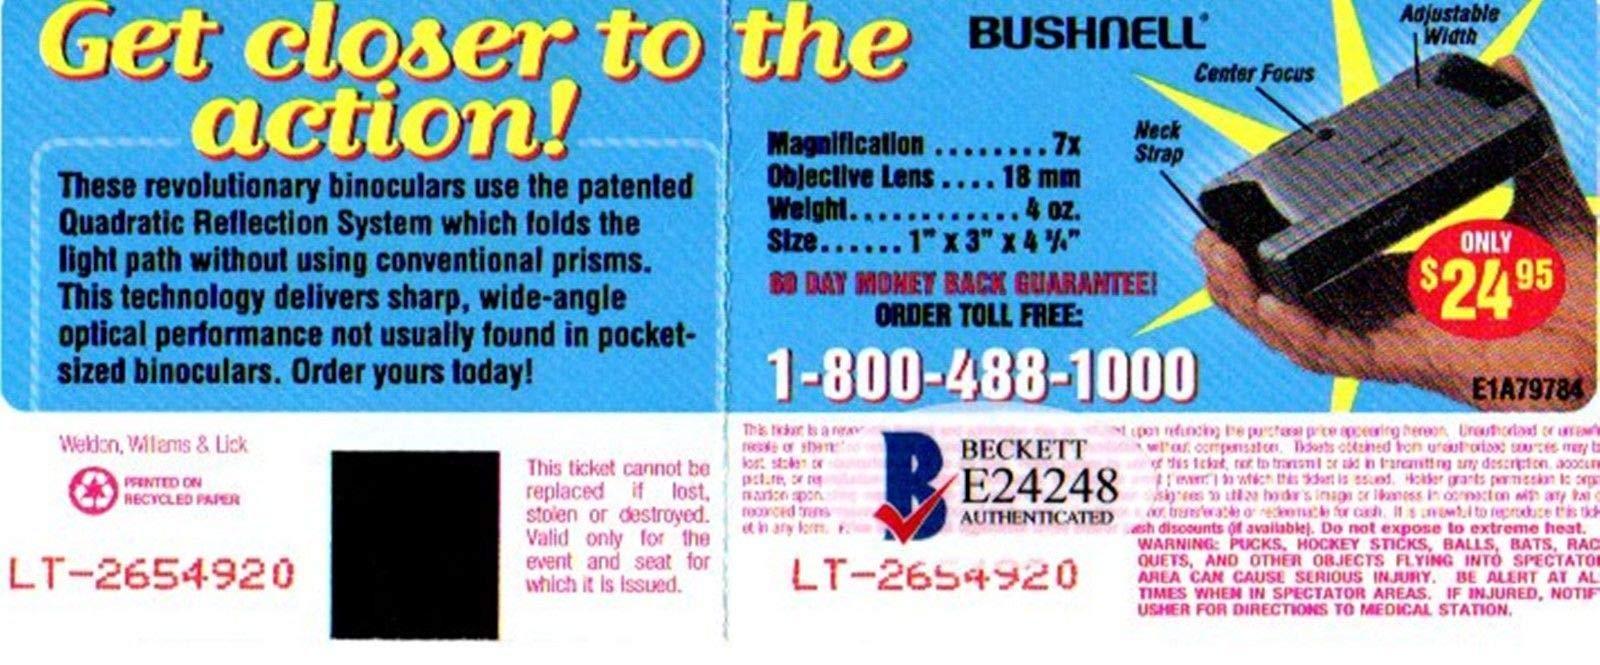 Beckett Authentic Bas Brian Wilson Imagination Autographed Signed Autographed Signed 2000 Ticket Stub E24248